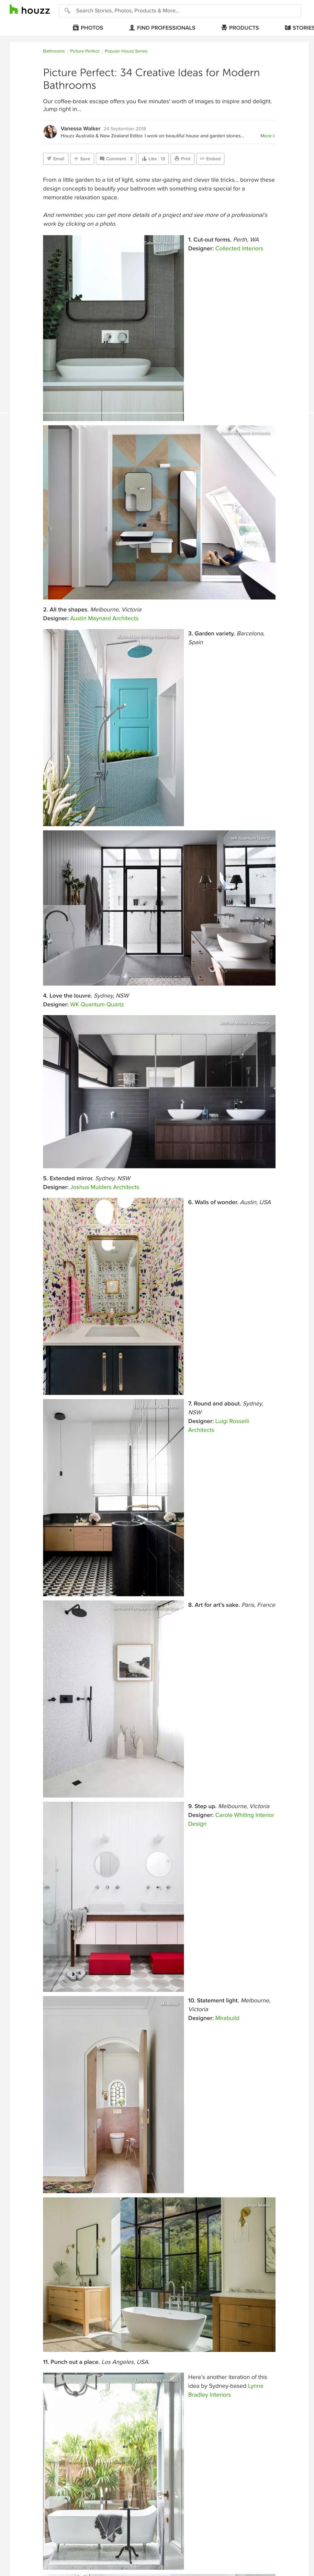 Editscreencapture-houzz-au-ideabooks-111839471-list-picture-perfect-34-creative-ideas-for-modern-bathrooms-2018-10-26-10_19_59.jpg